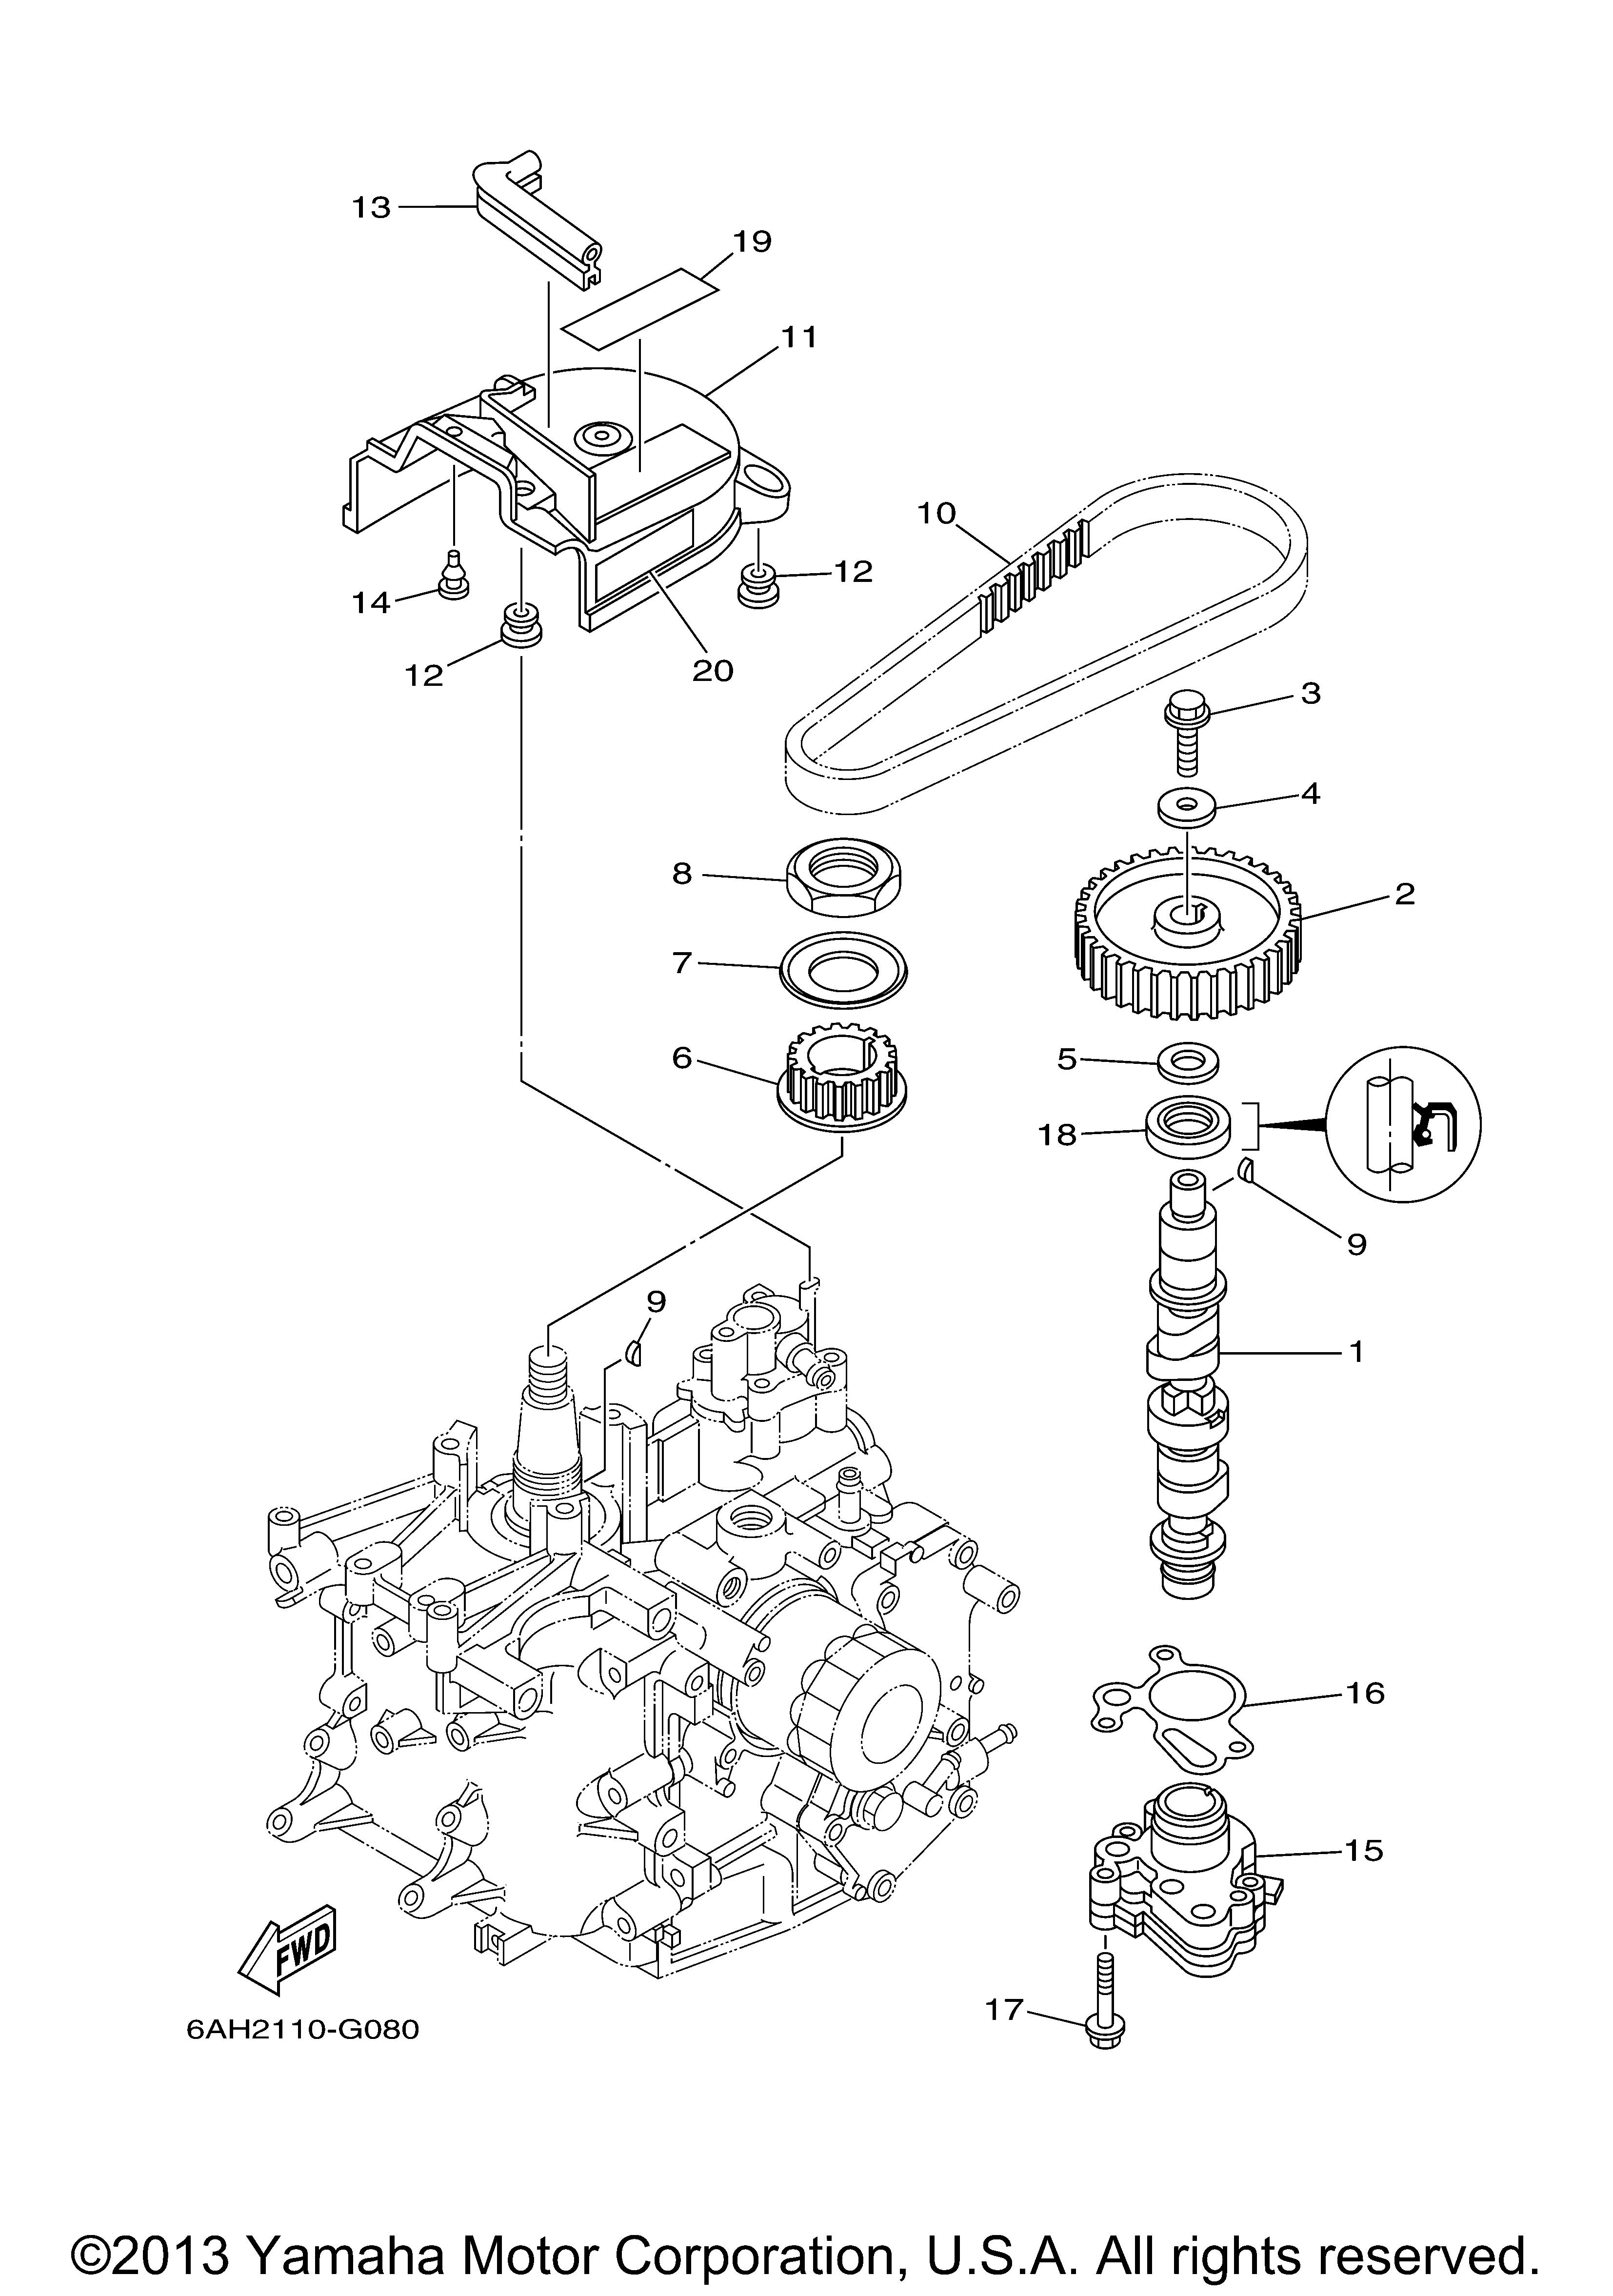 Yamaha | OUTBOARD | 20 HP | F20ELR | OIL PUMP - Yamaha Outboard